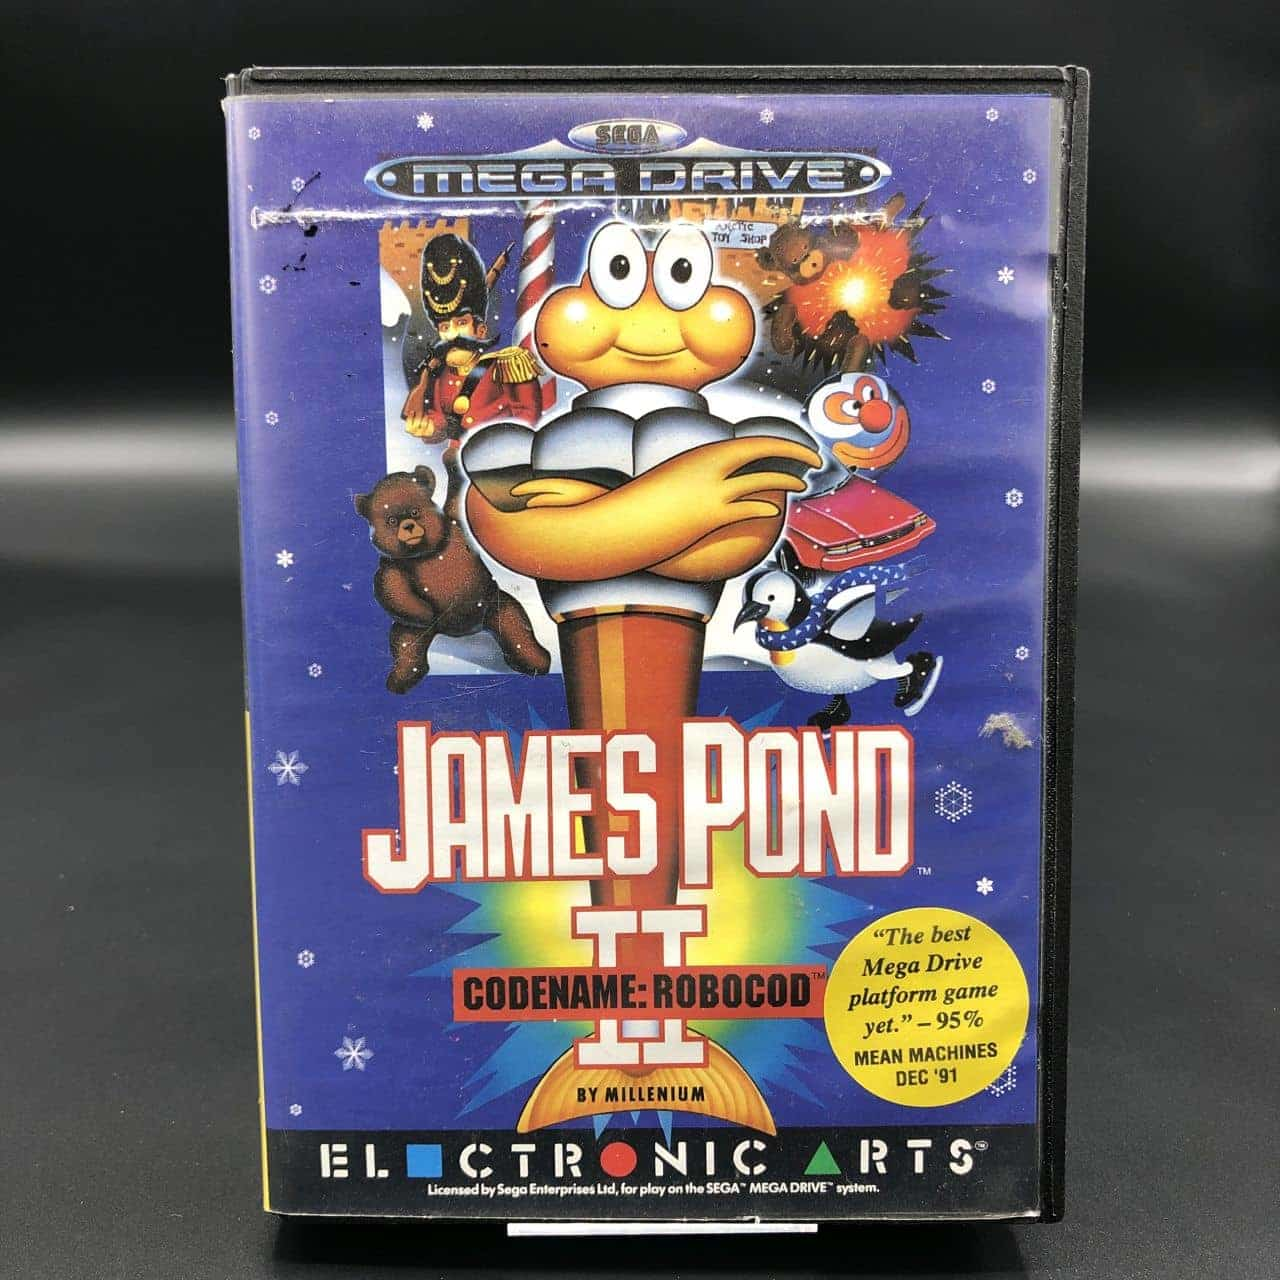 James Pond II - Codename: RoboCod (Komplett) (Gut) Sega Mega Drive